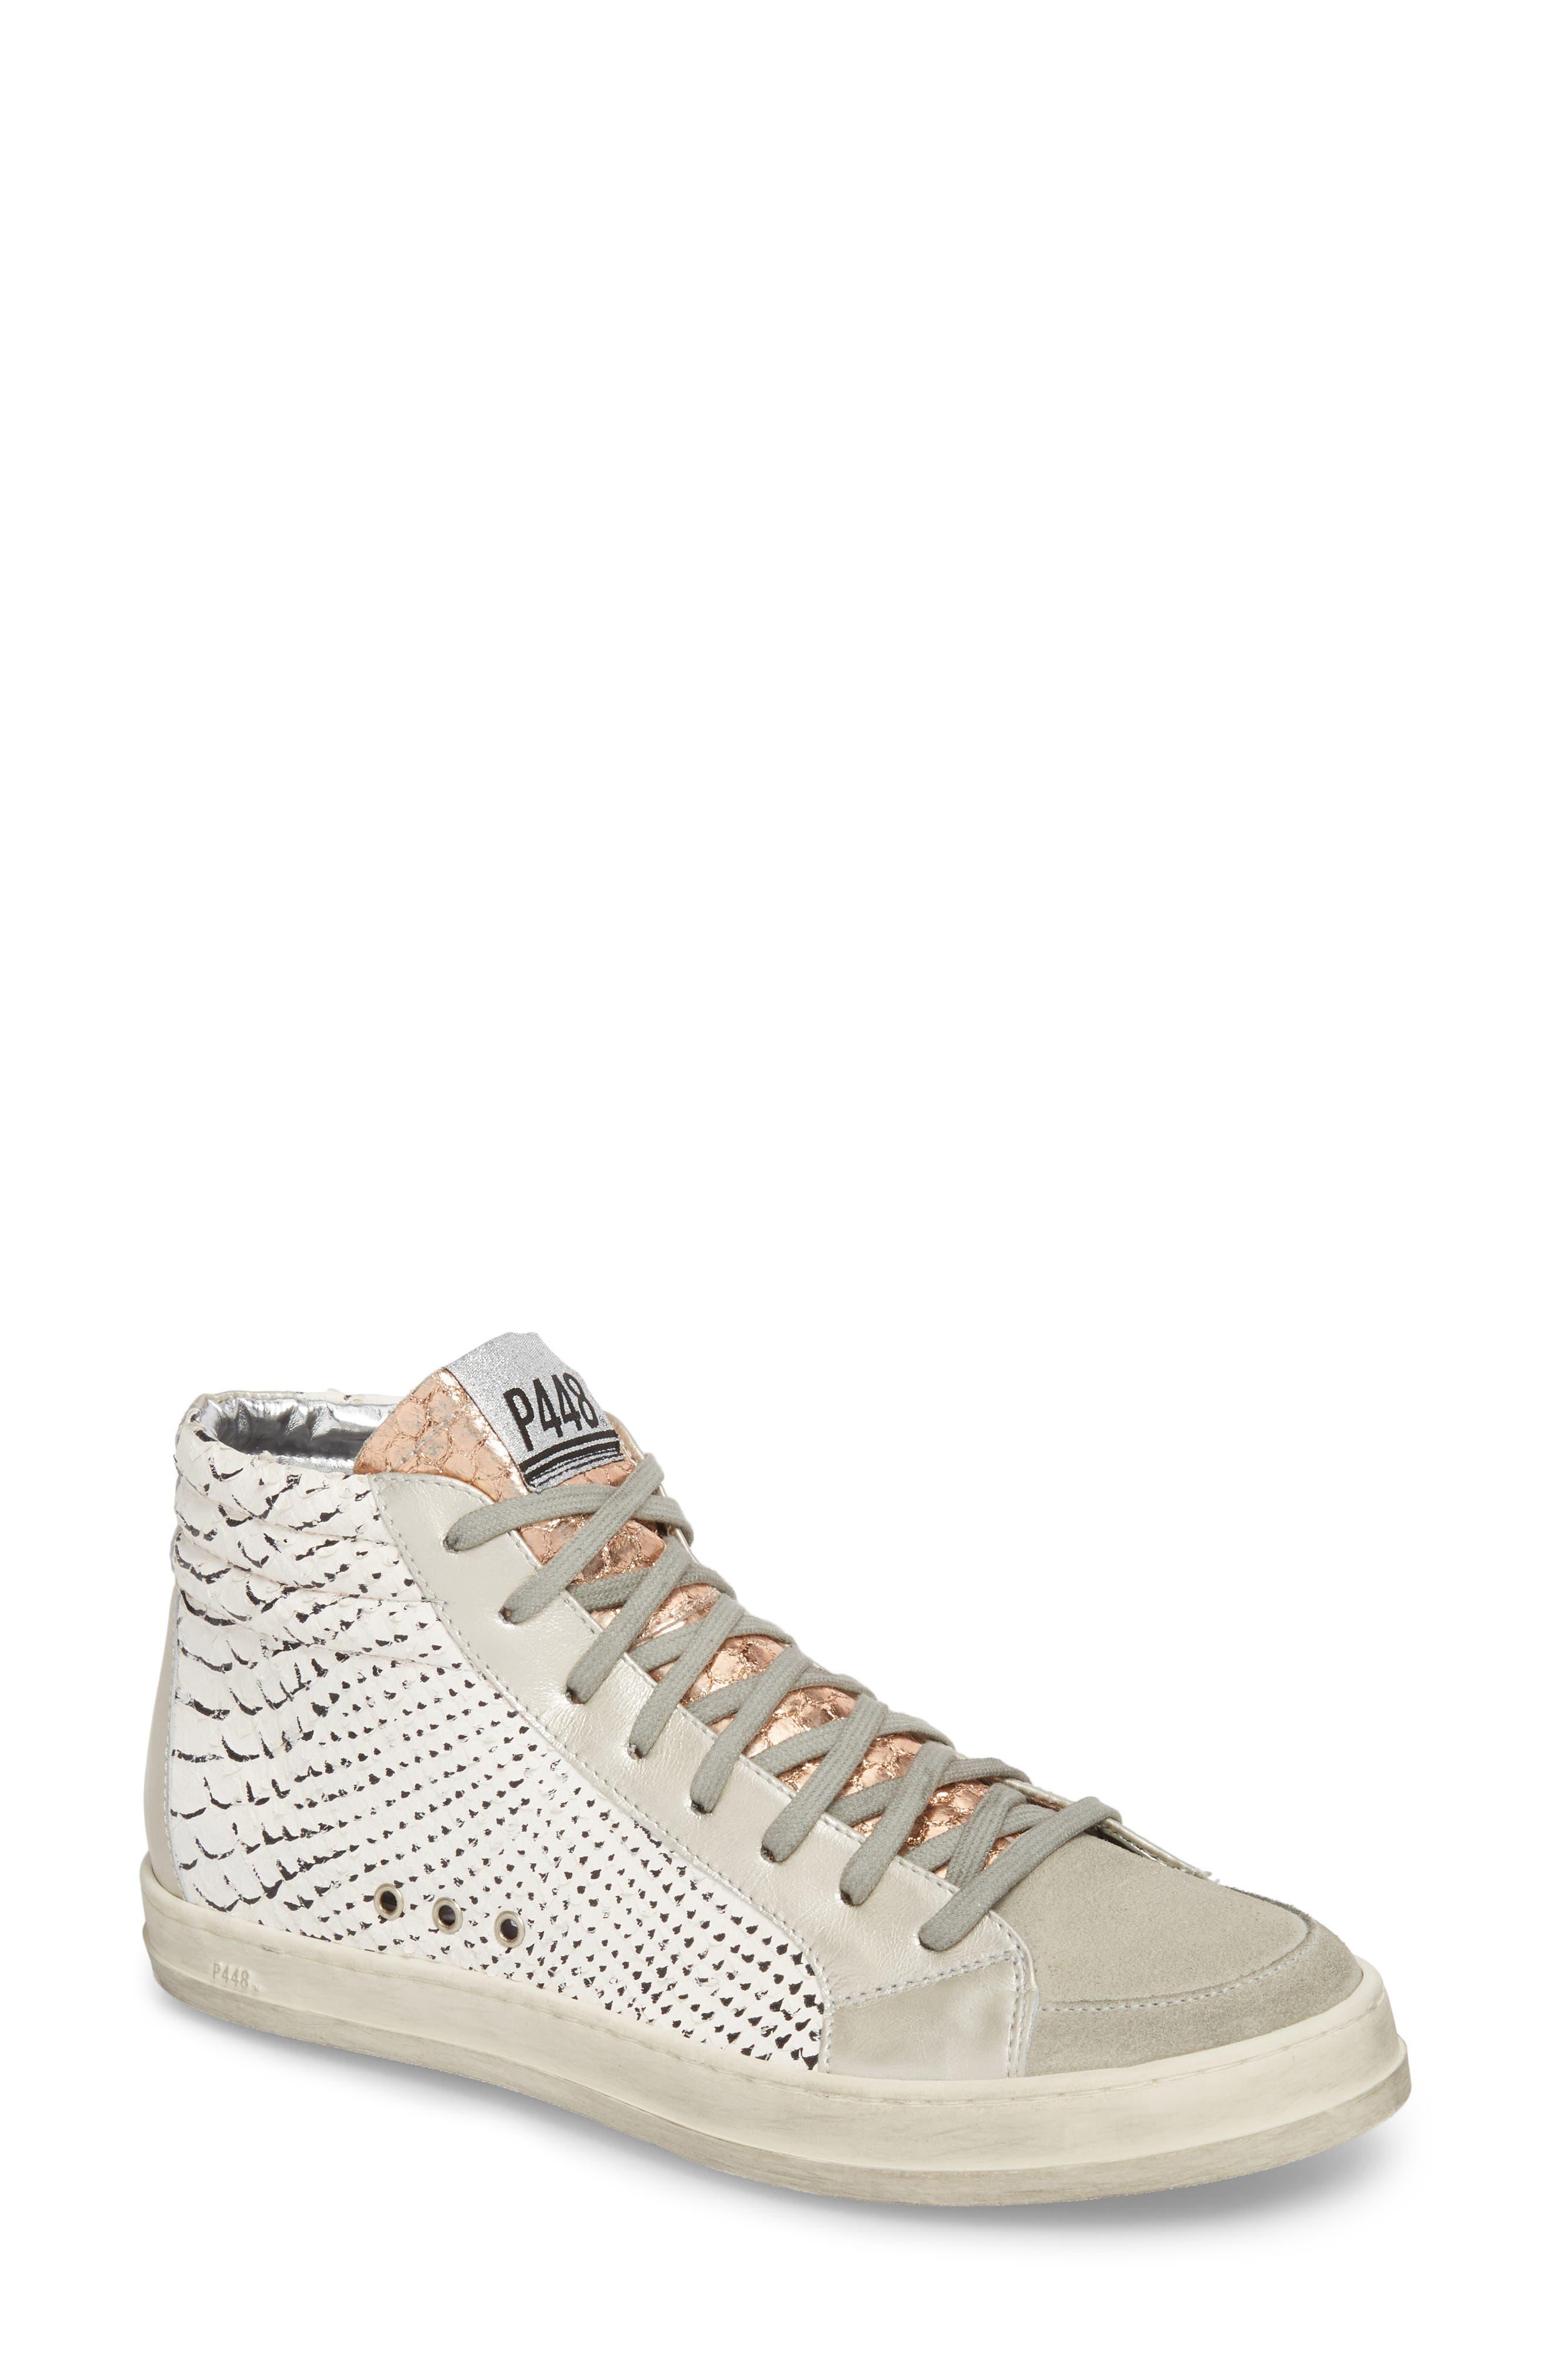 P448 Skate High Top Sneaker (Women)